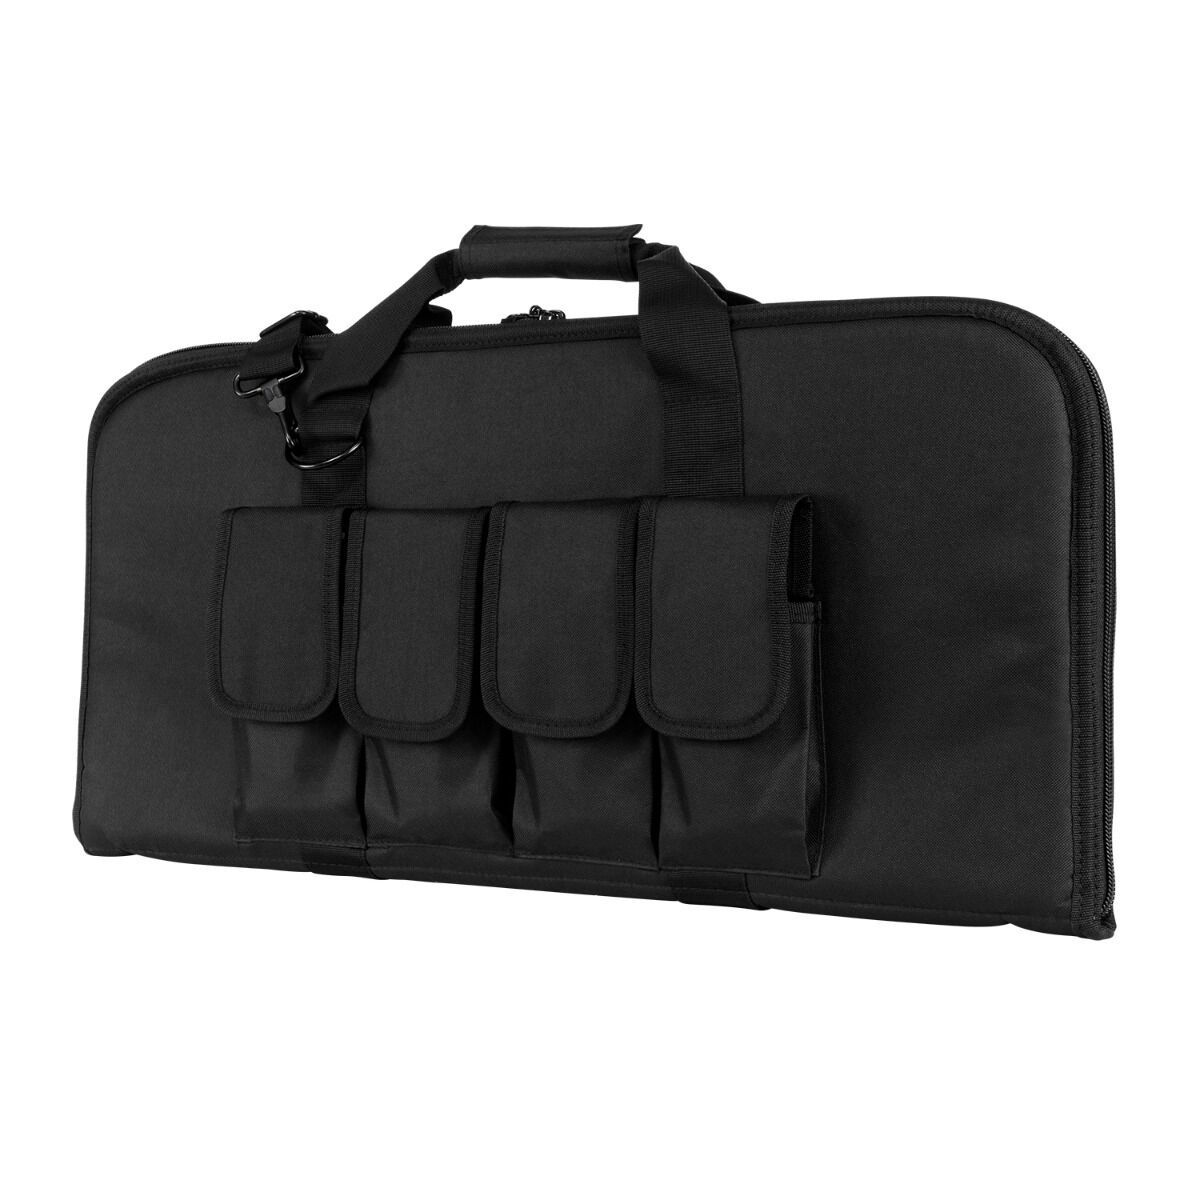 "VISM Tactical 28"" Subgun .223 5.56 Pistol Rifle Case Mag Pou"